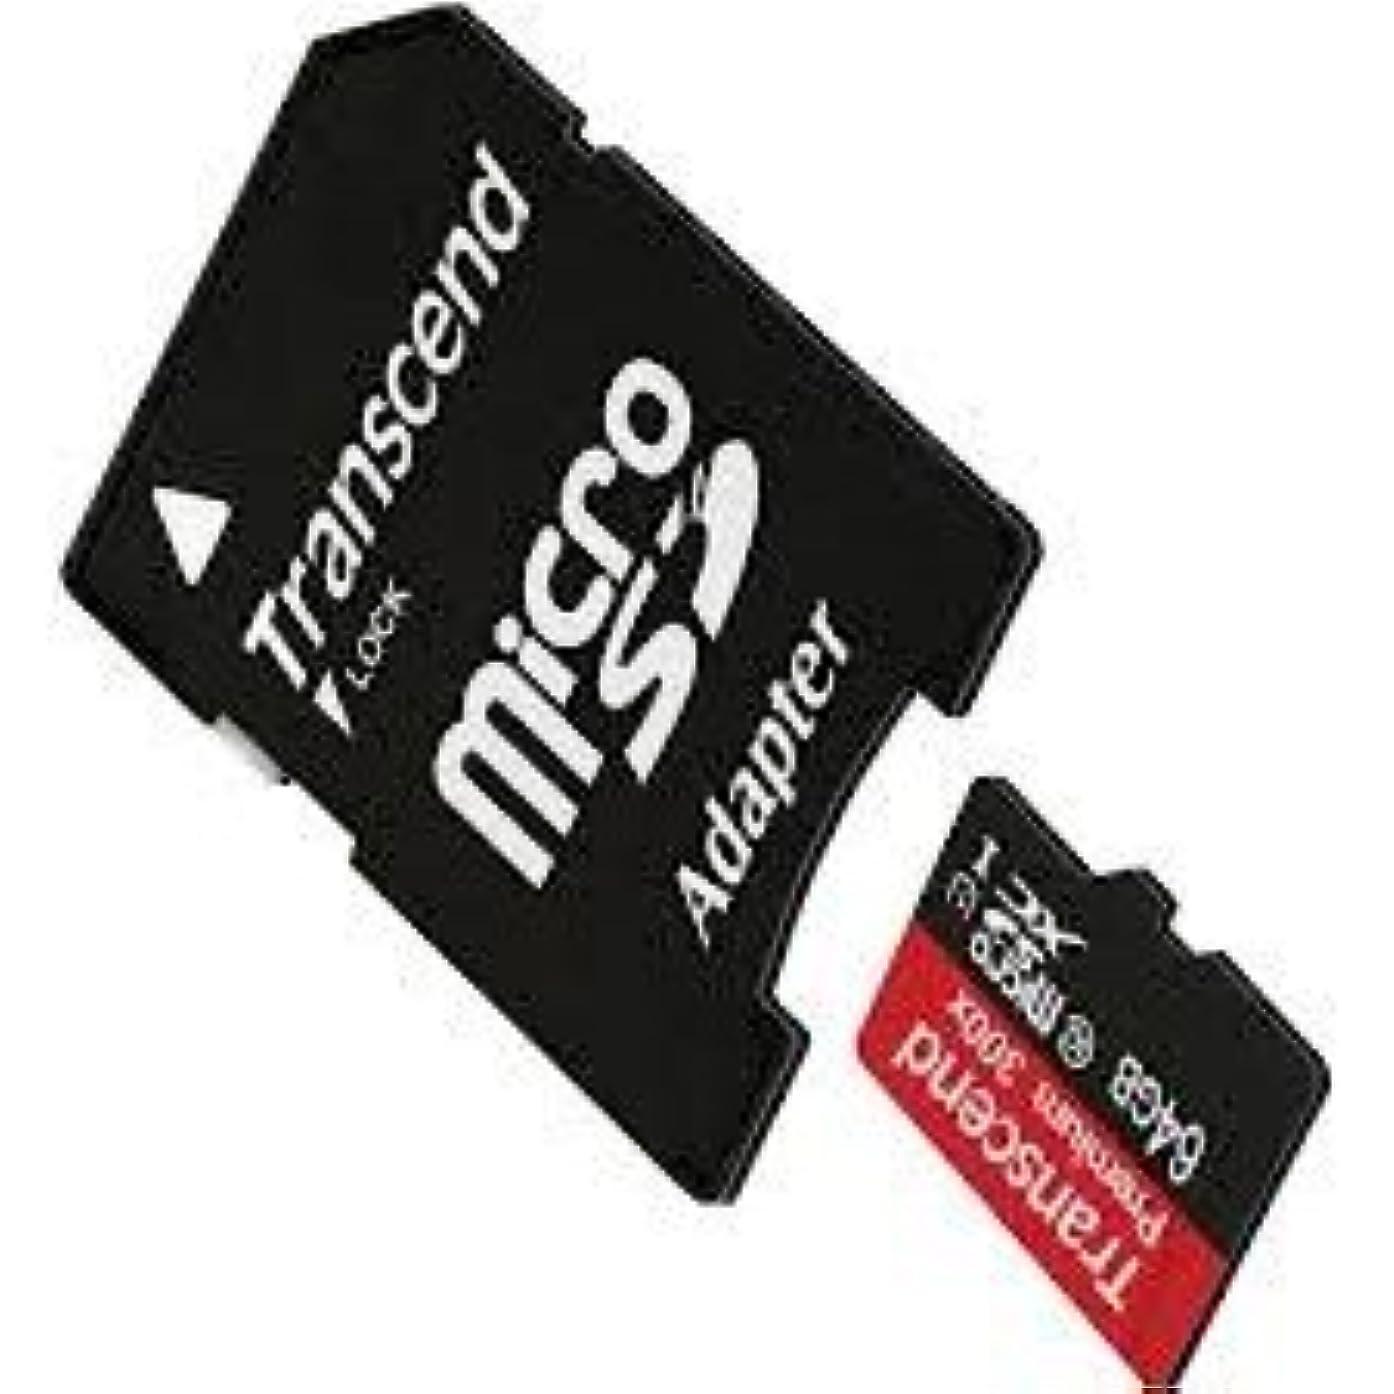 Casio Exilim EX-FR10 Digital Camera Memory Card 64GB microSDHC Memory Card with SD Adapter